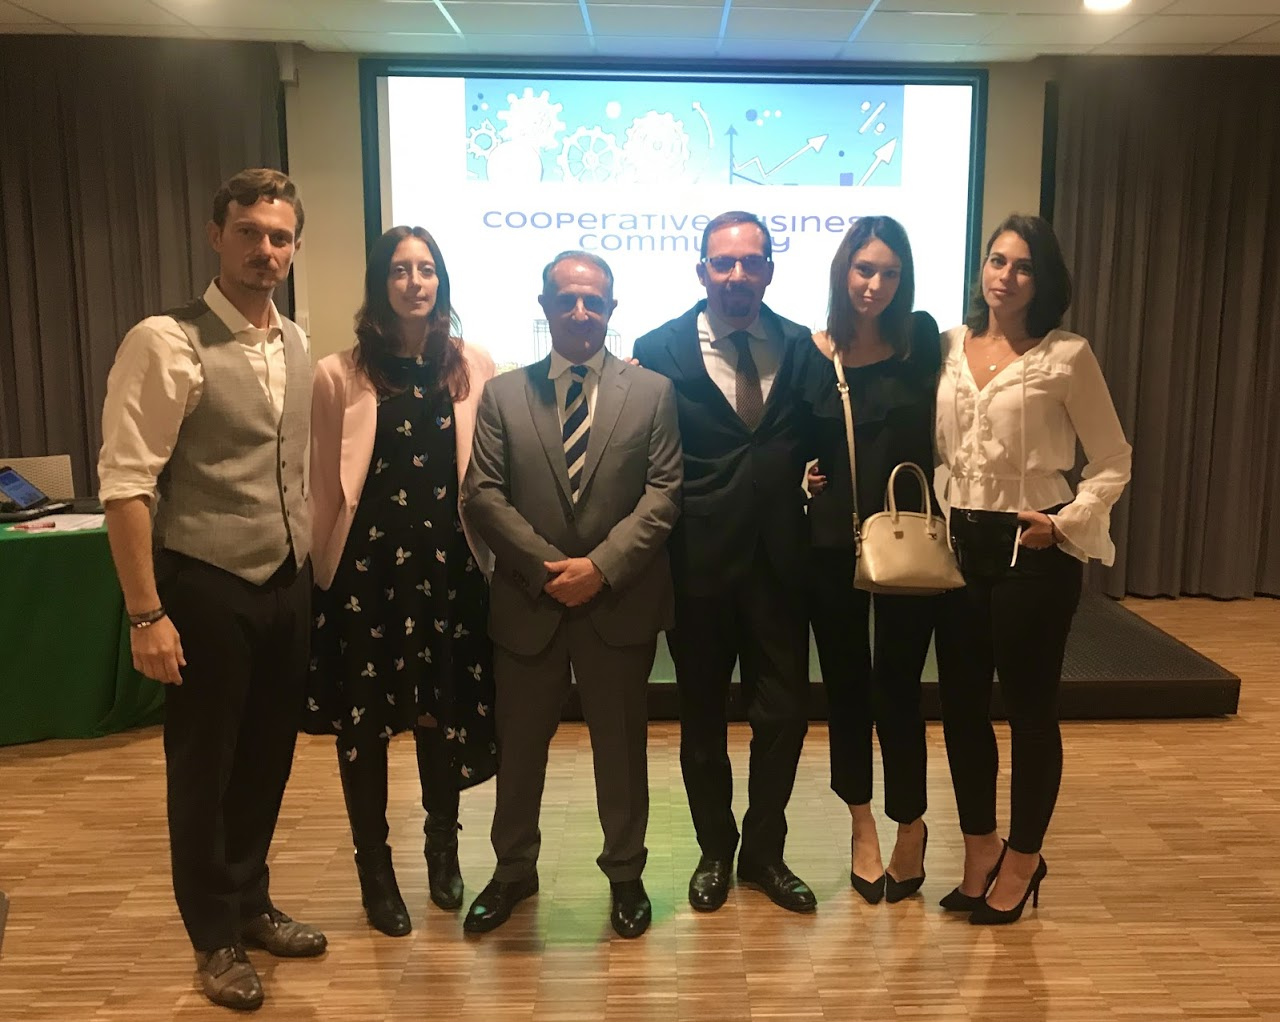 Cooperative Business Community Team